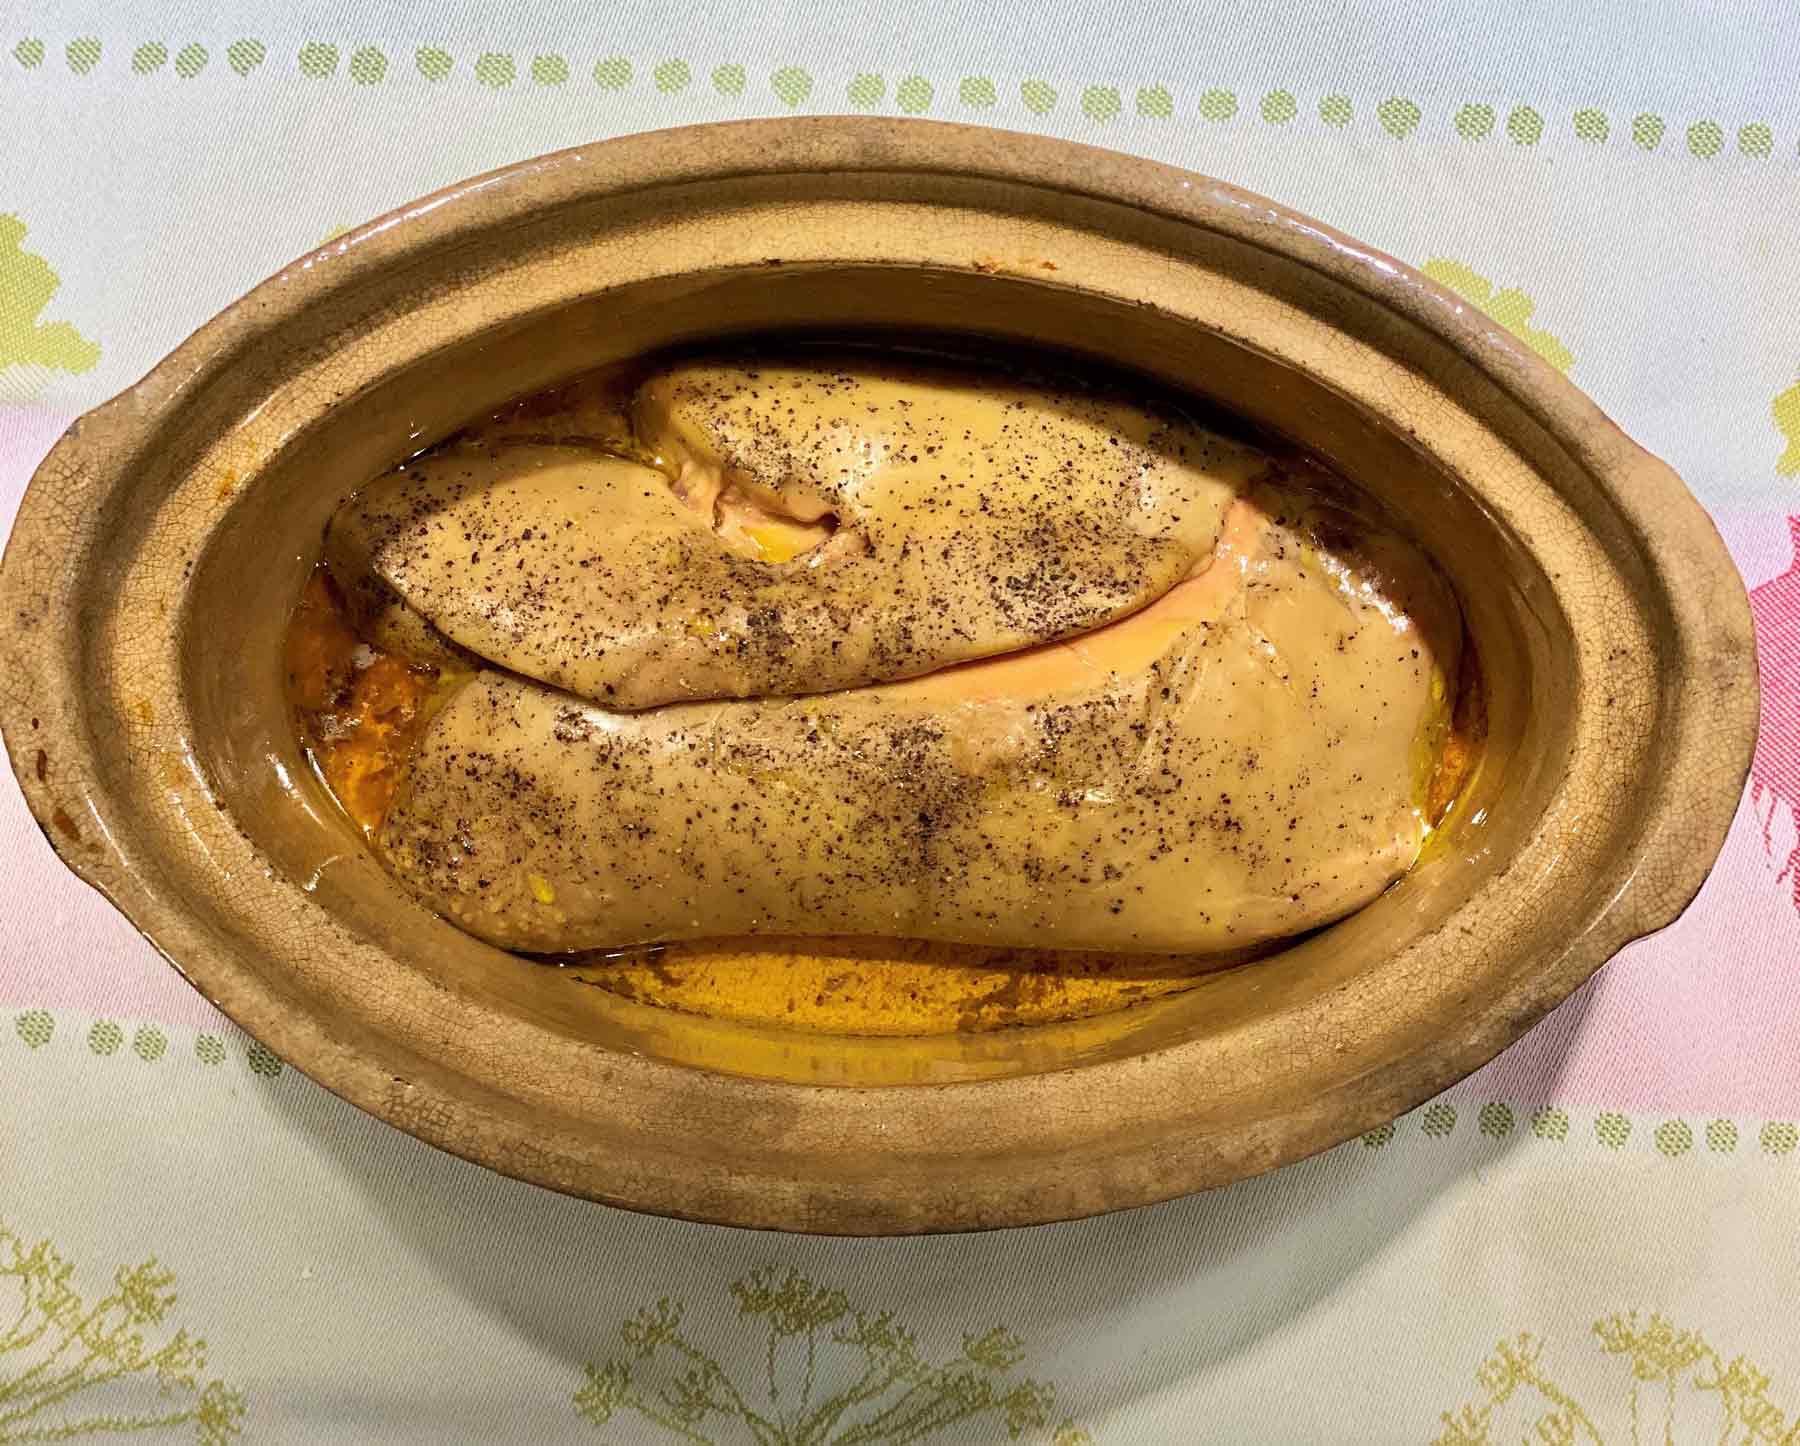 foie gras melted fat